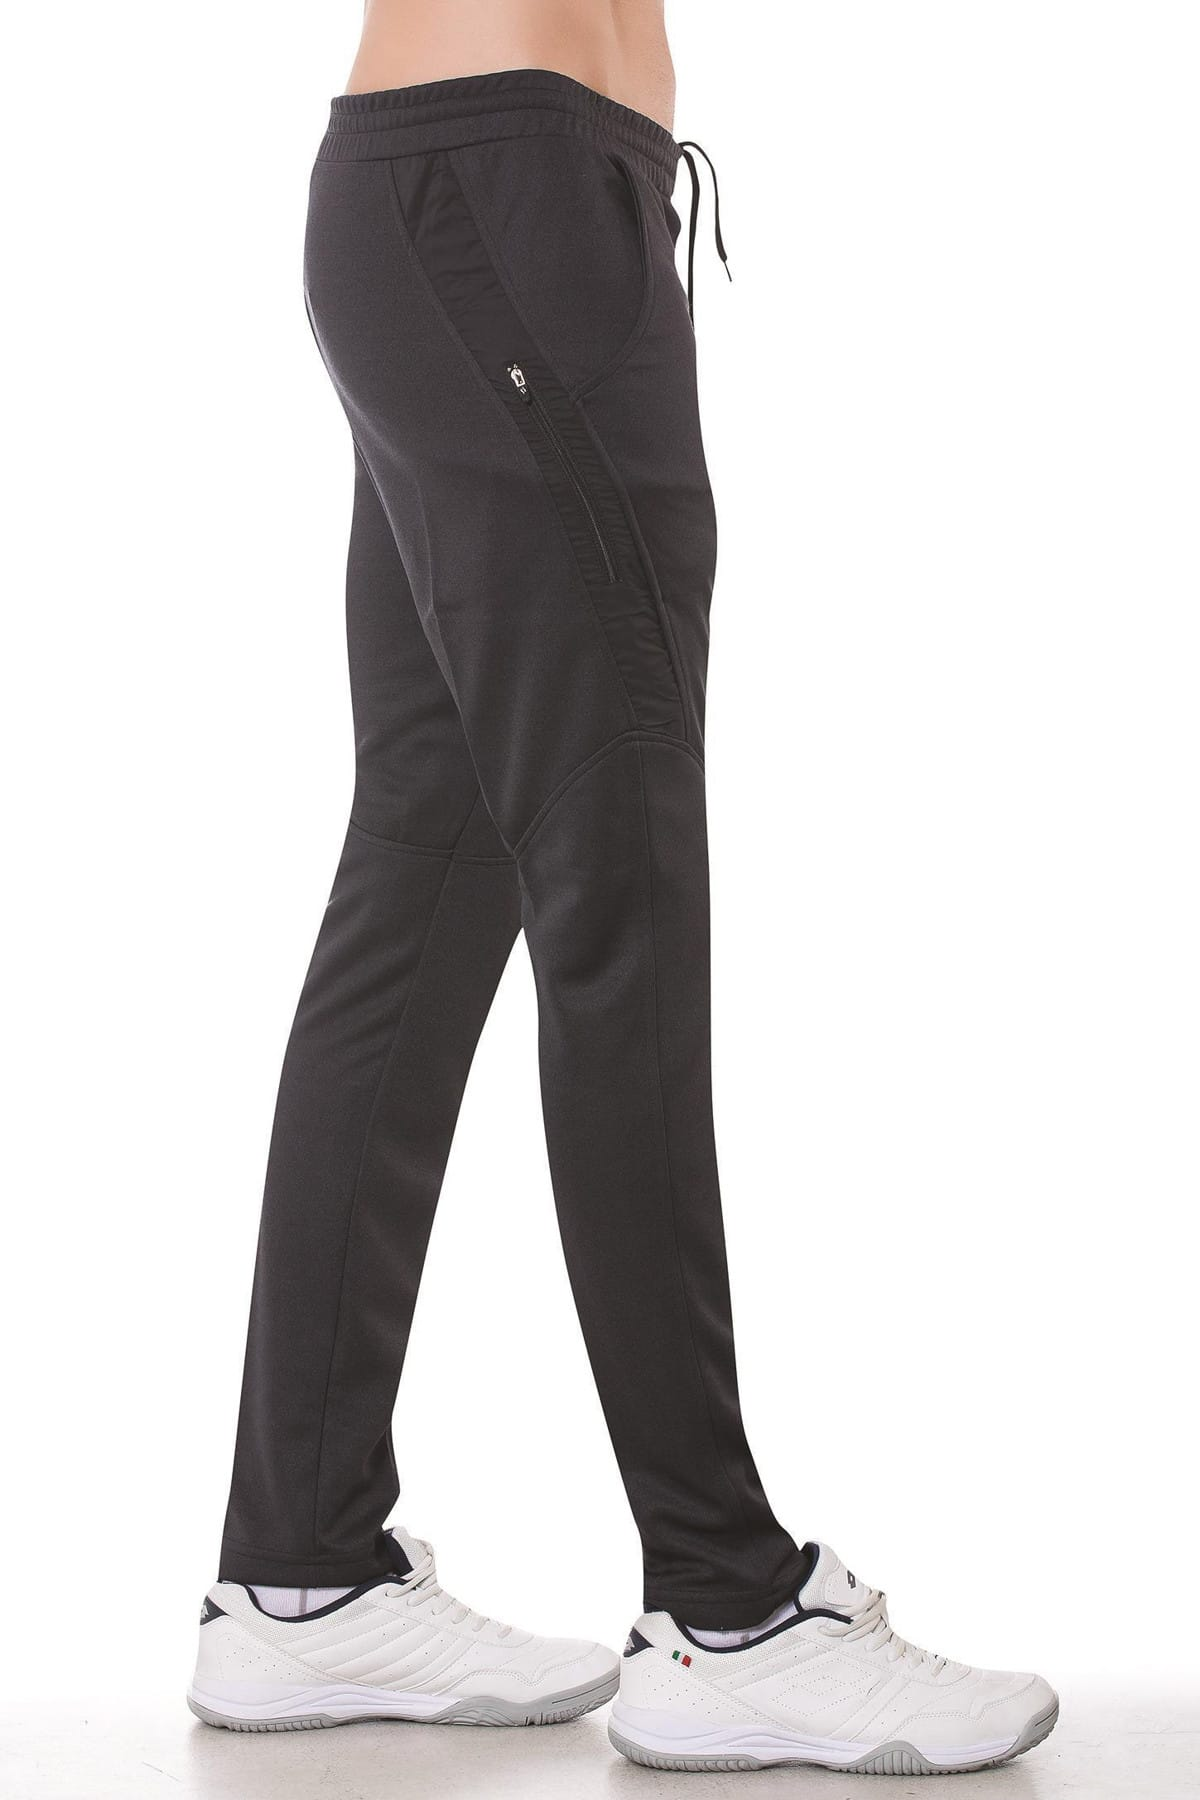 Crozwise Erkek Pantolon Polyestermouline65-2099 - 65-2099 1